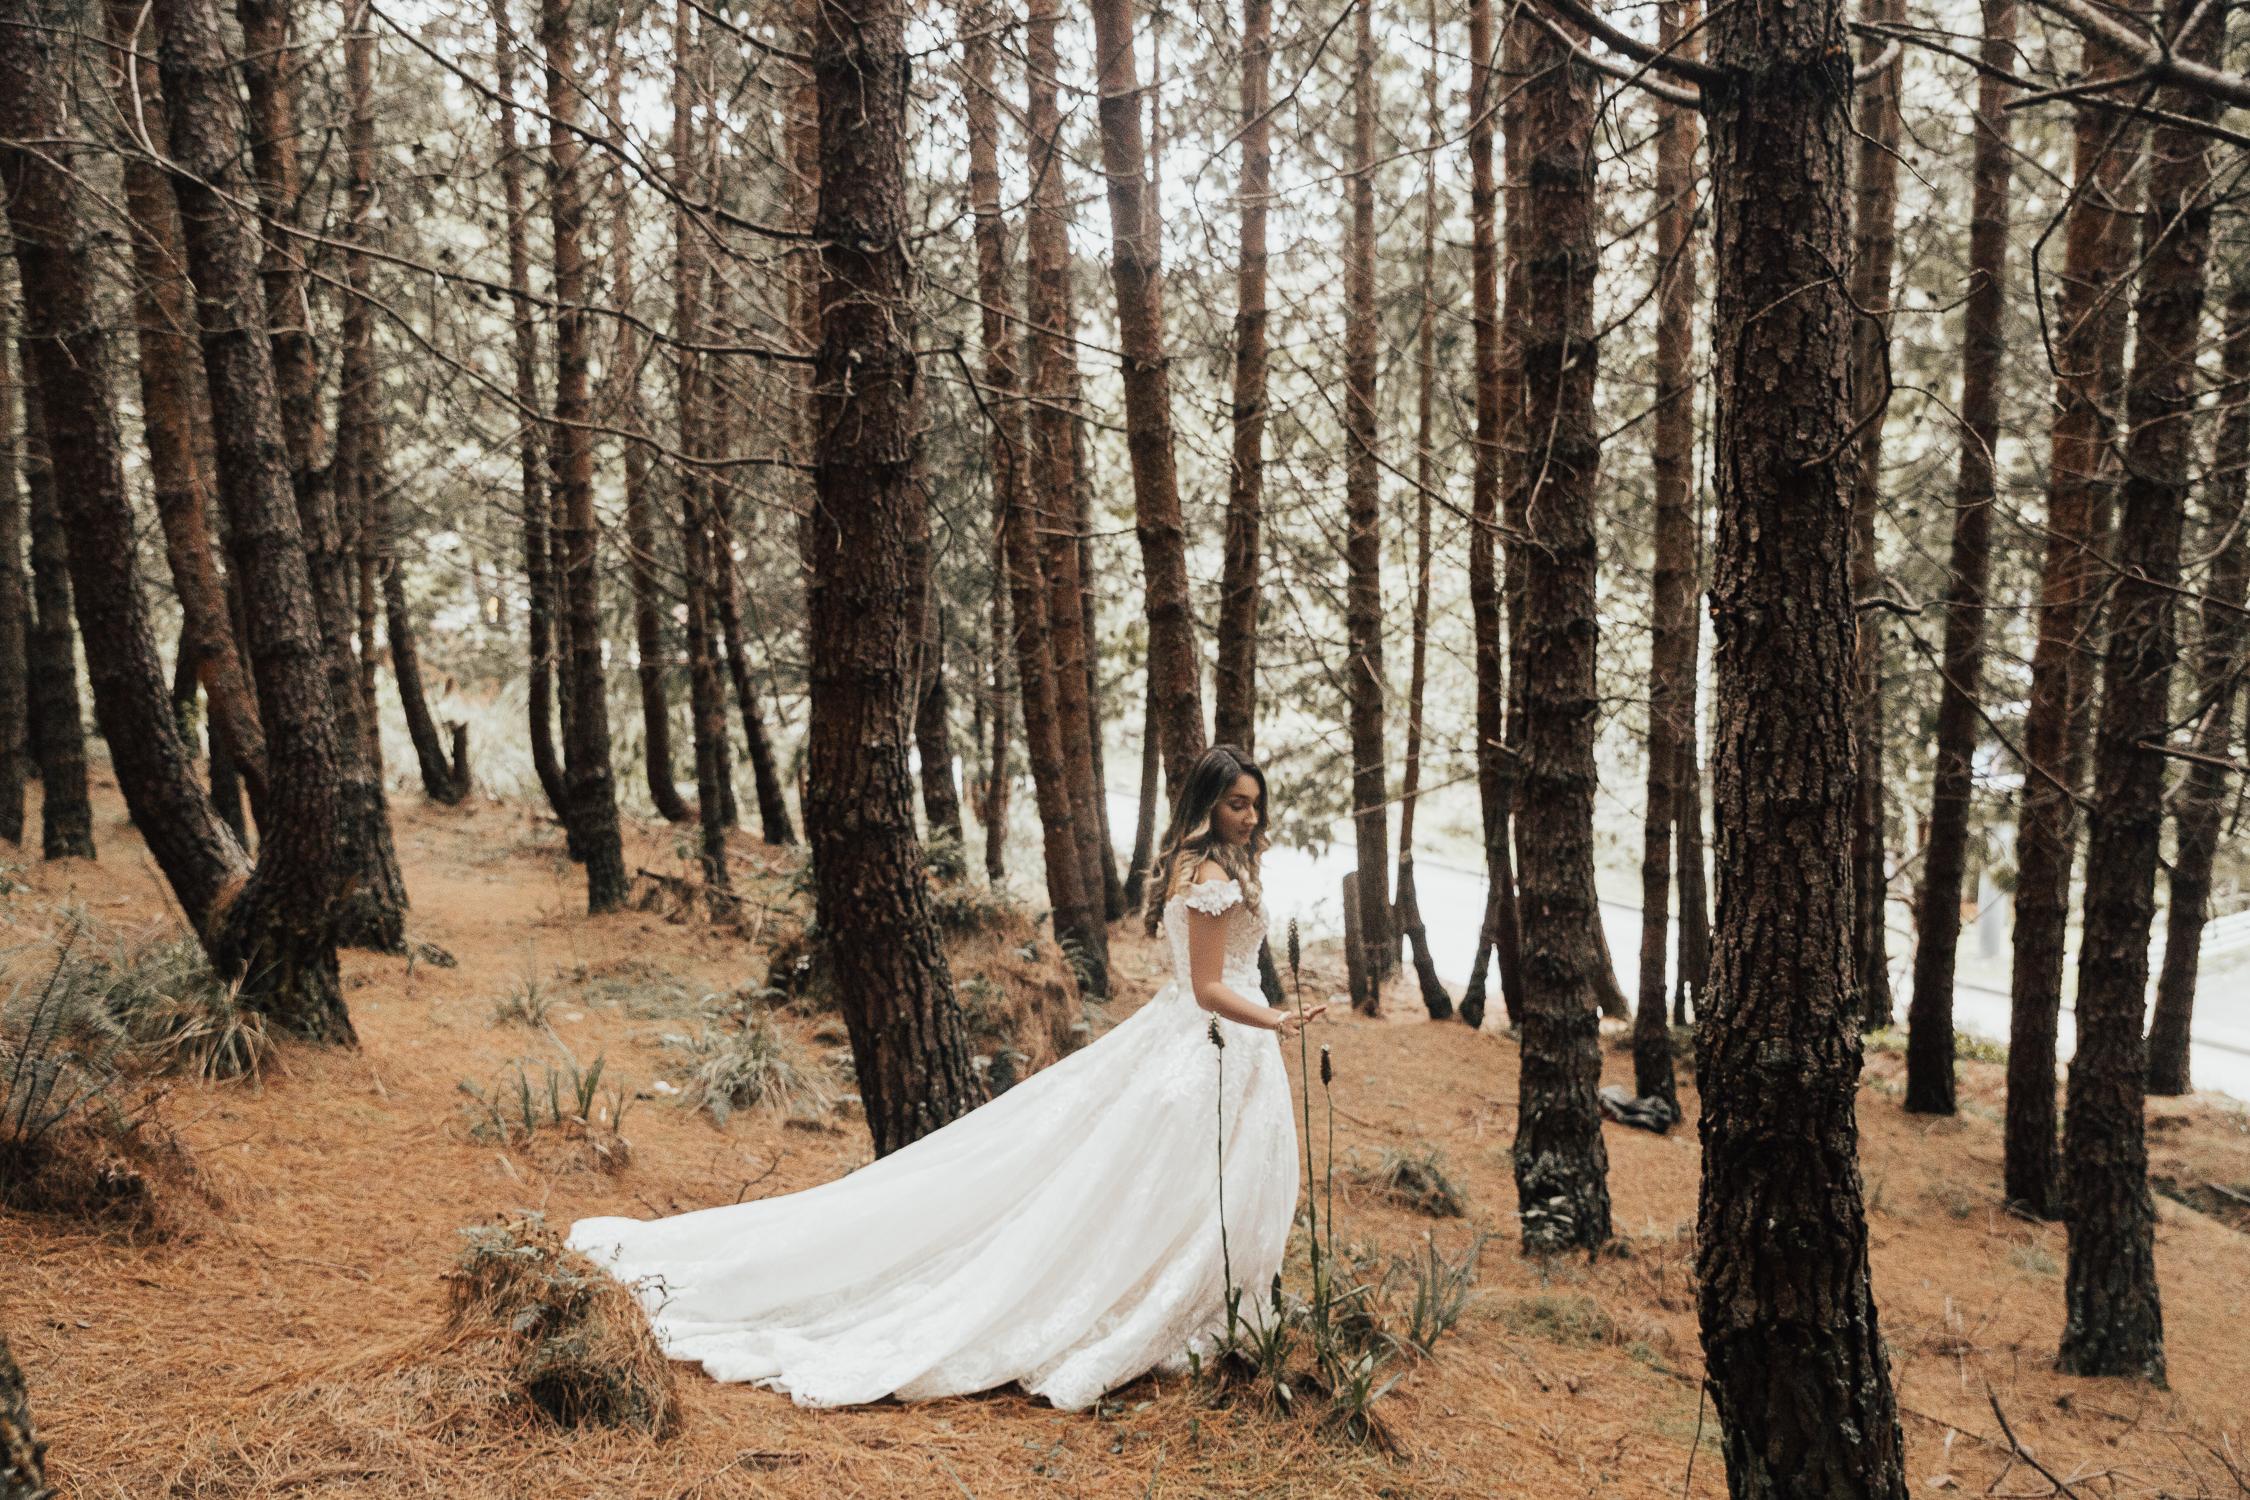 Michelle-Agurto-Fotografia-Bodas-Destination-Wedding-Photographer-Ecuador-Sesion-Johanna-Eduardo-62.JPG